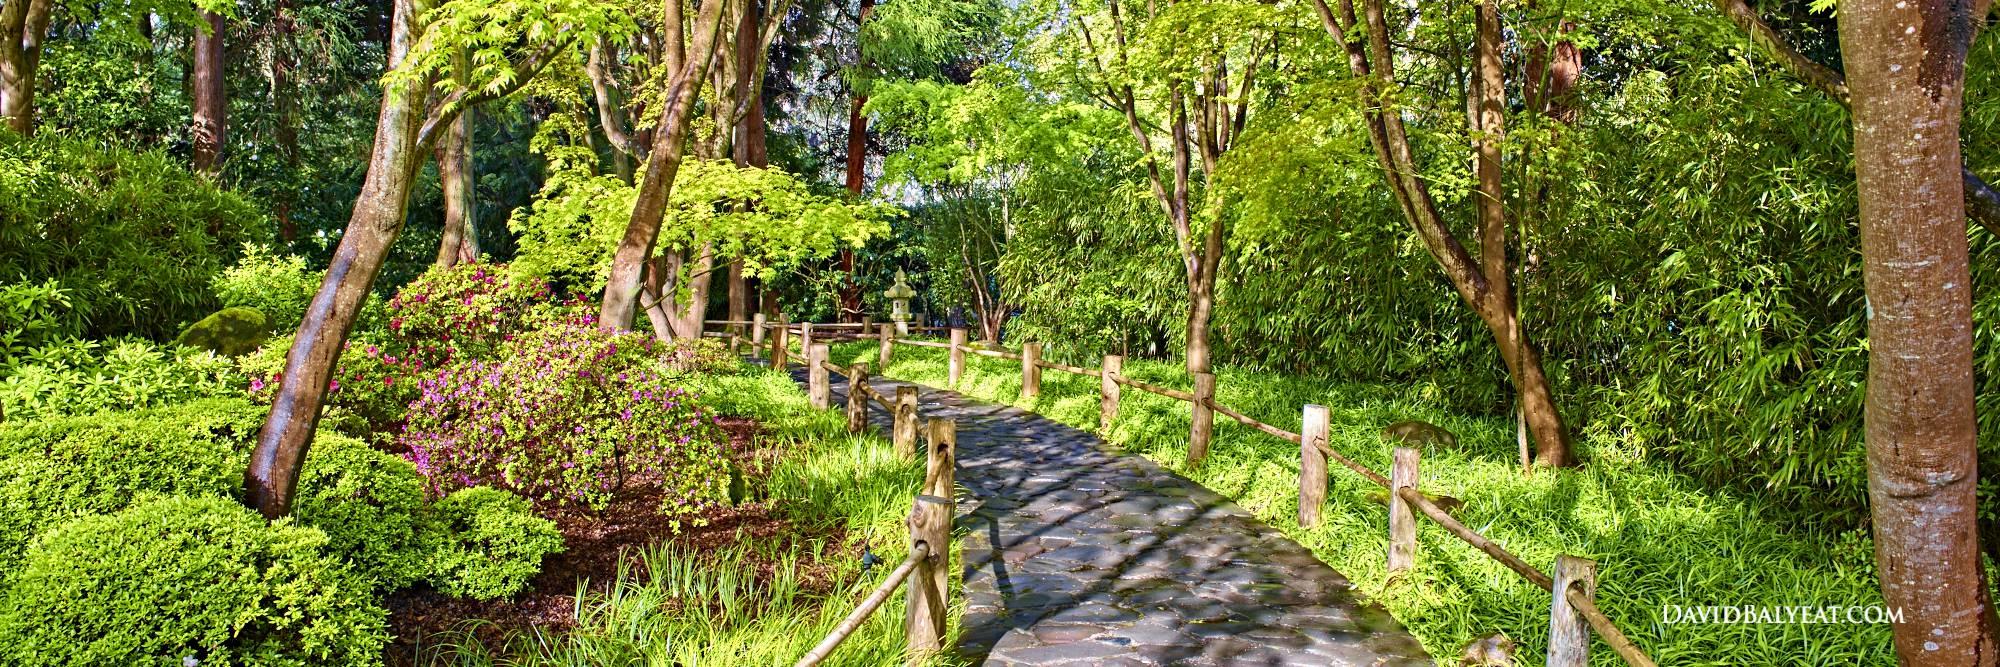 Botanical Garden San Francisco Japanese Section Stroll Panoramic HD Photography